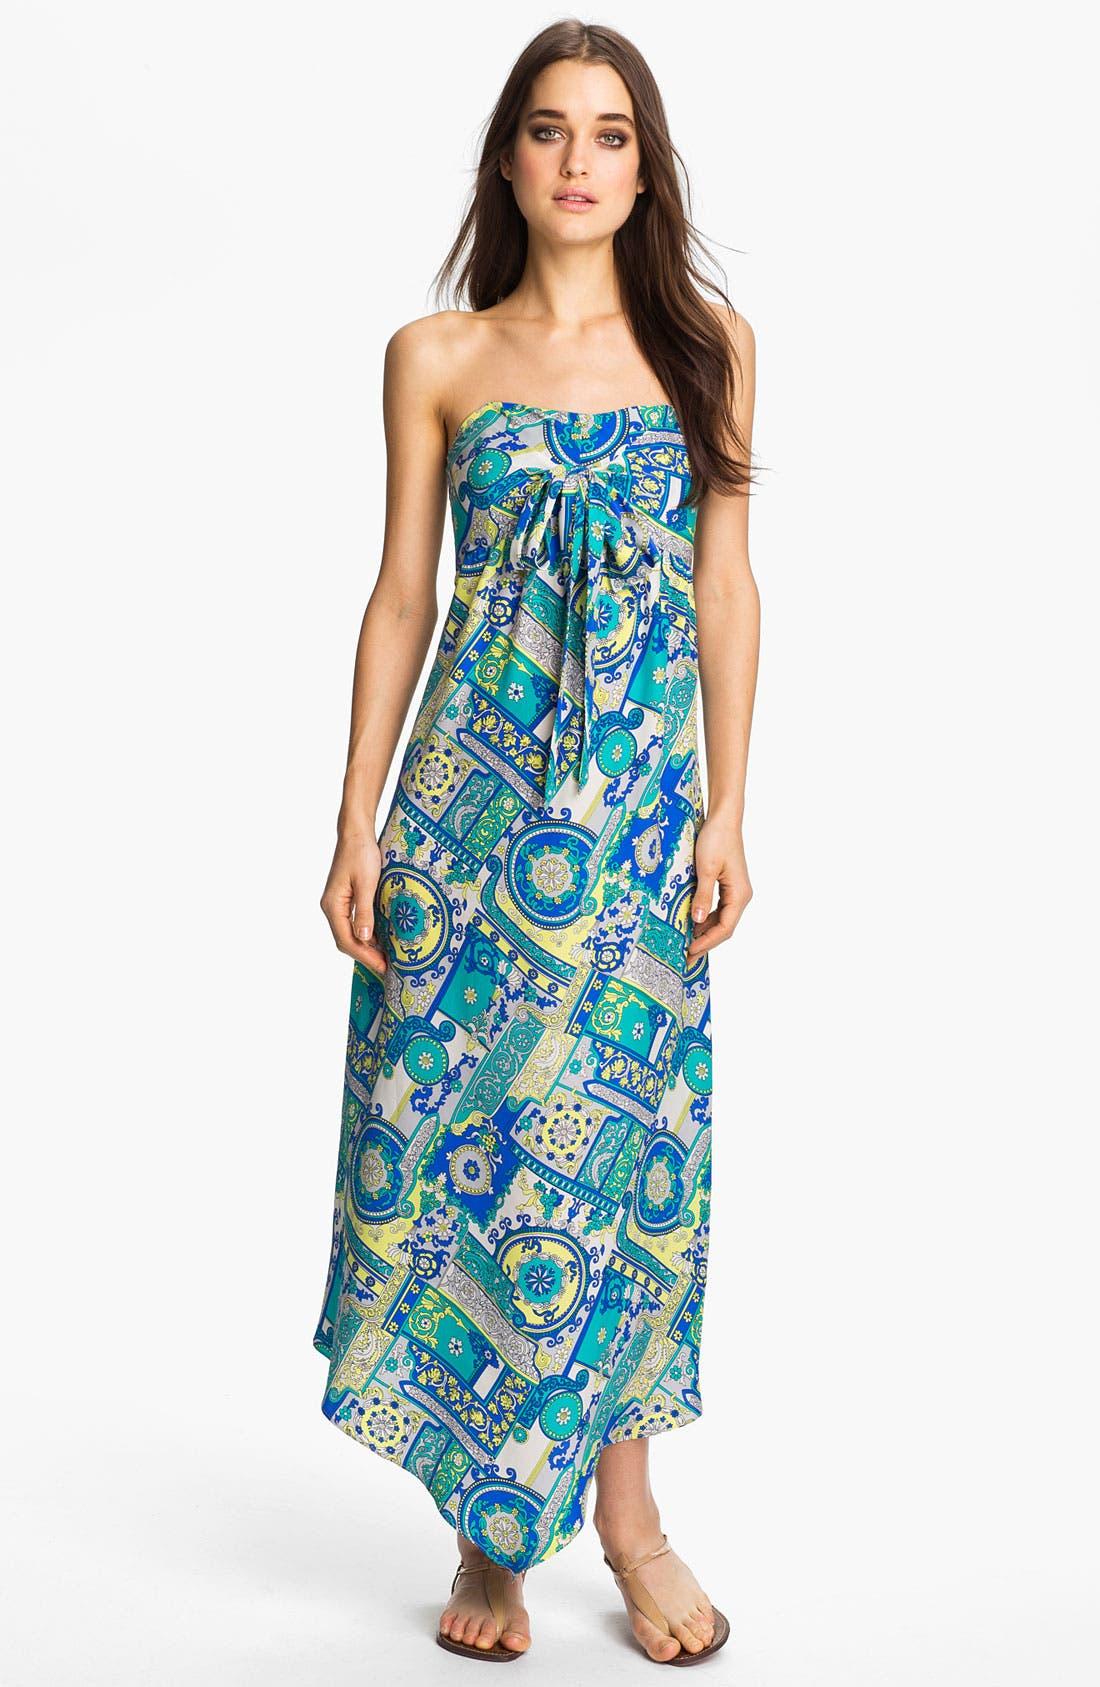 Main Image - ALICE & TRIXIE 'Savannah' Convertible Tie Silk Maxi Dress